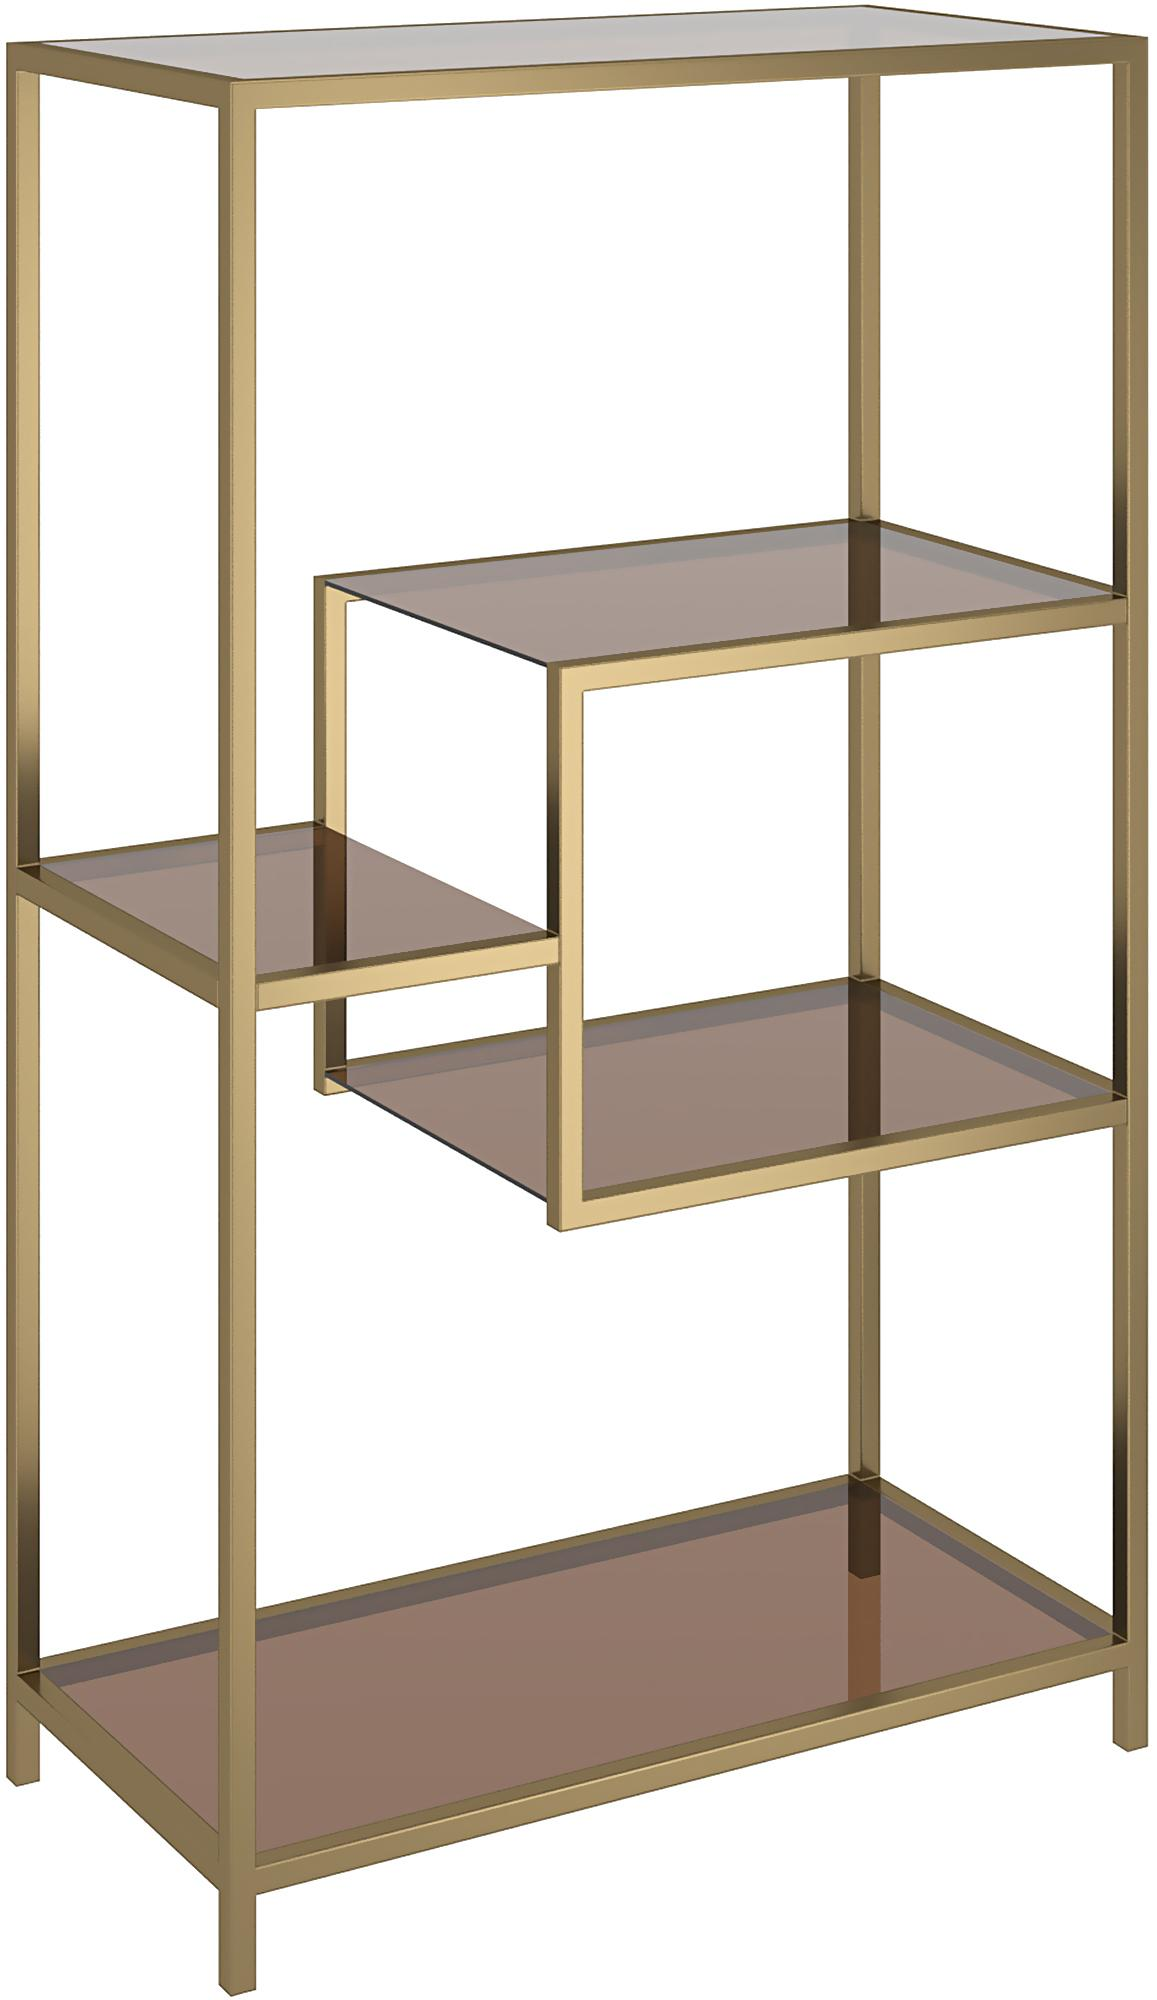 Estantería de metal Loft, Estructura: metal con pintura en polv, Estantería: vidrio laminado tintado, Latón, An 60 x Al 100 cm